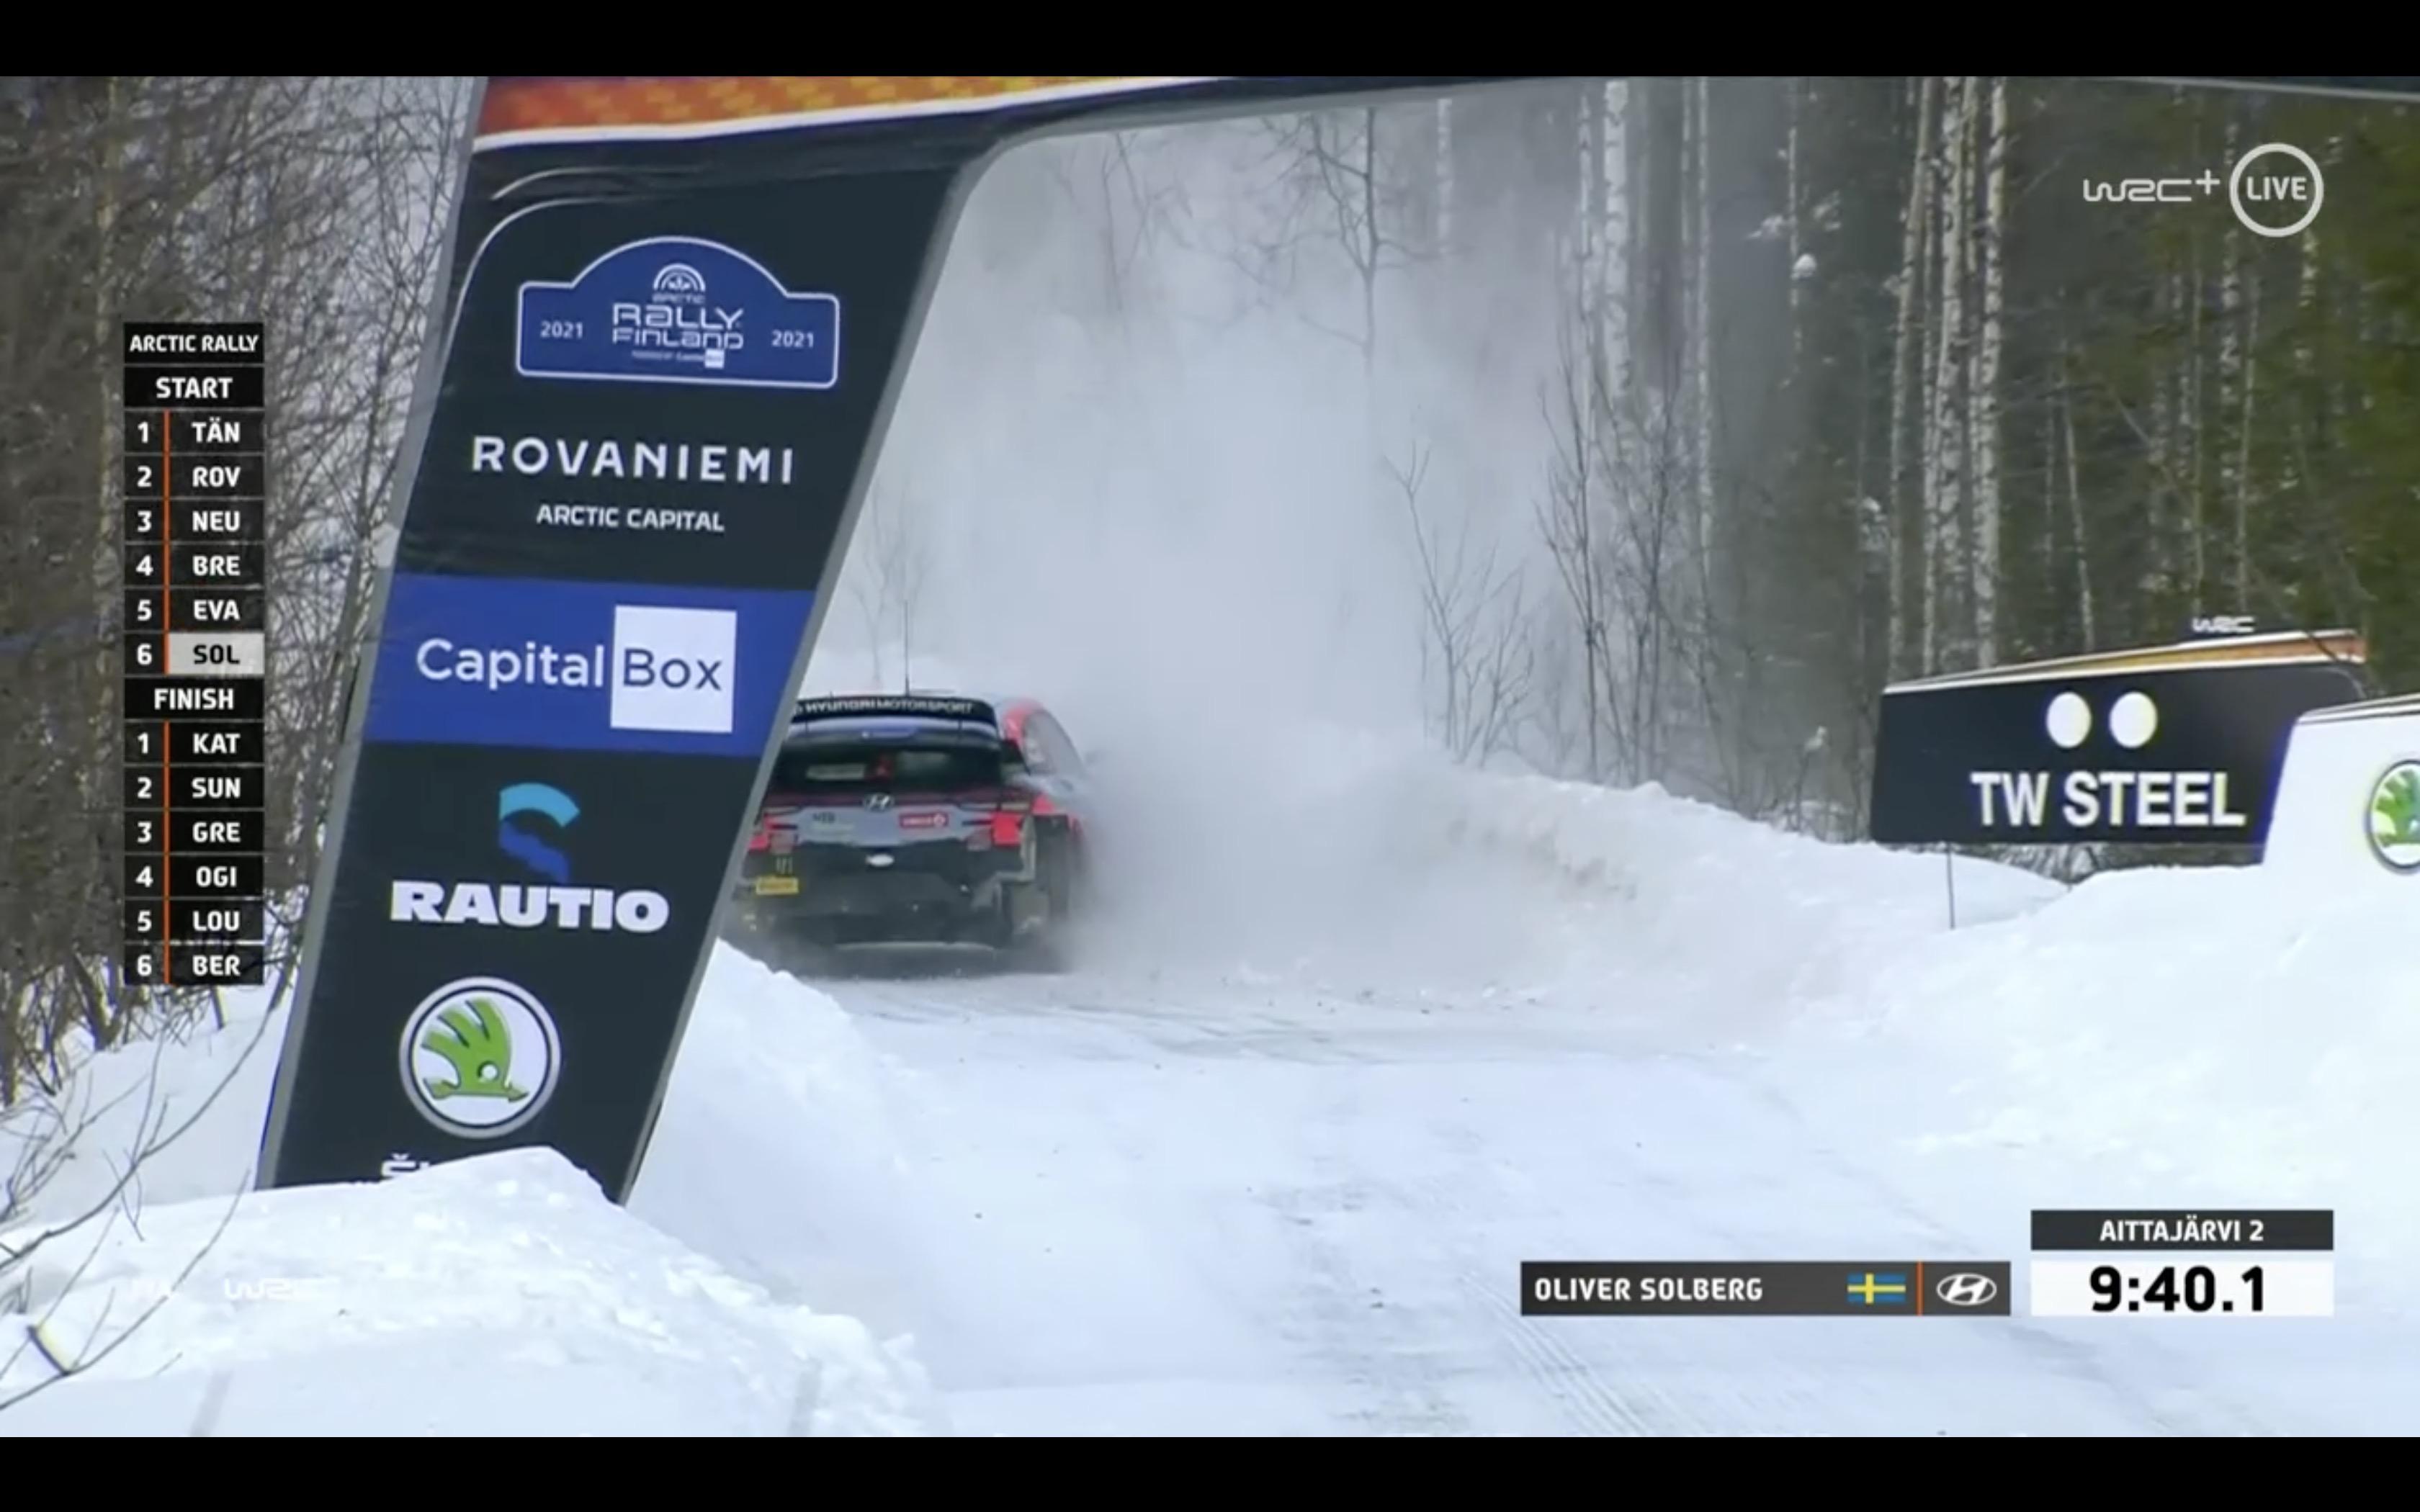 WRC: Arctic Rally Finland - Powered by CapitalBox [26-28 Febrero] - Página 8 EvT7s2VWQAEq0o-?format=jpg&name=4096x4096